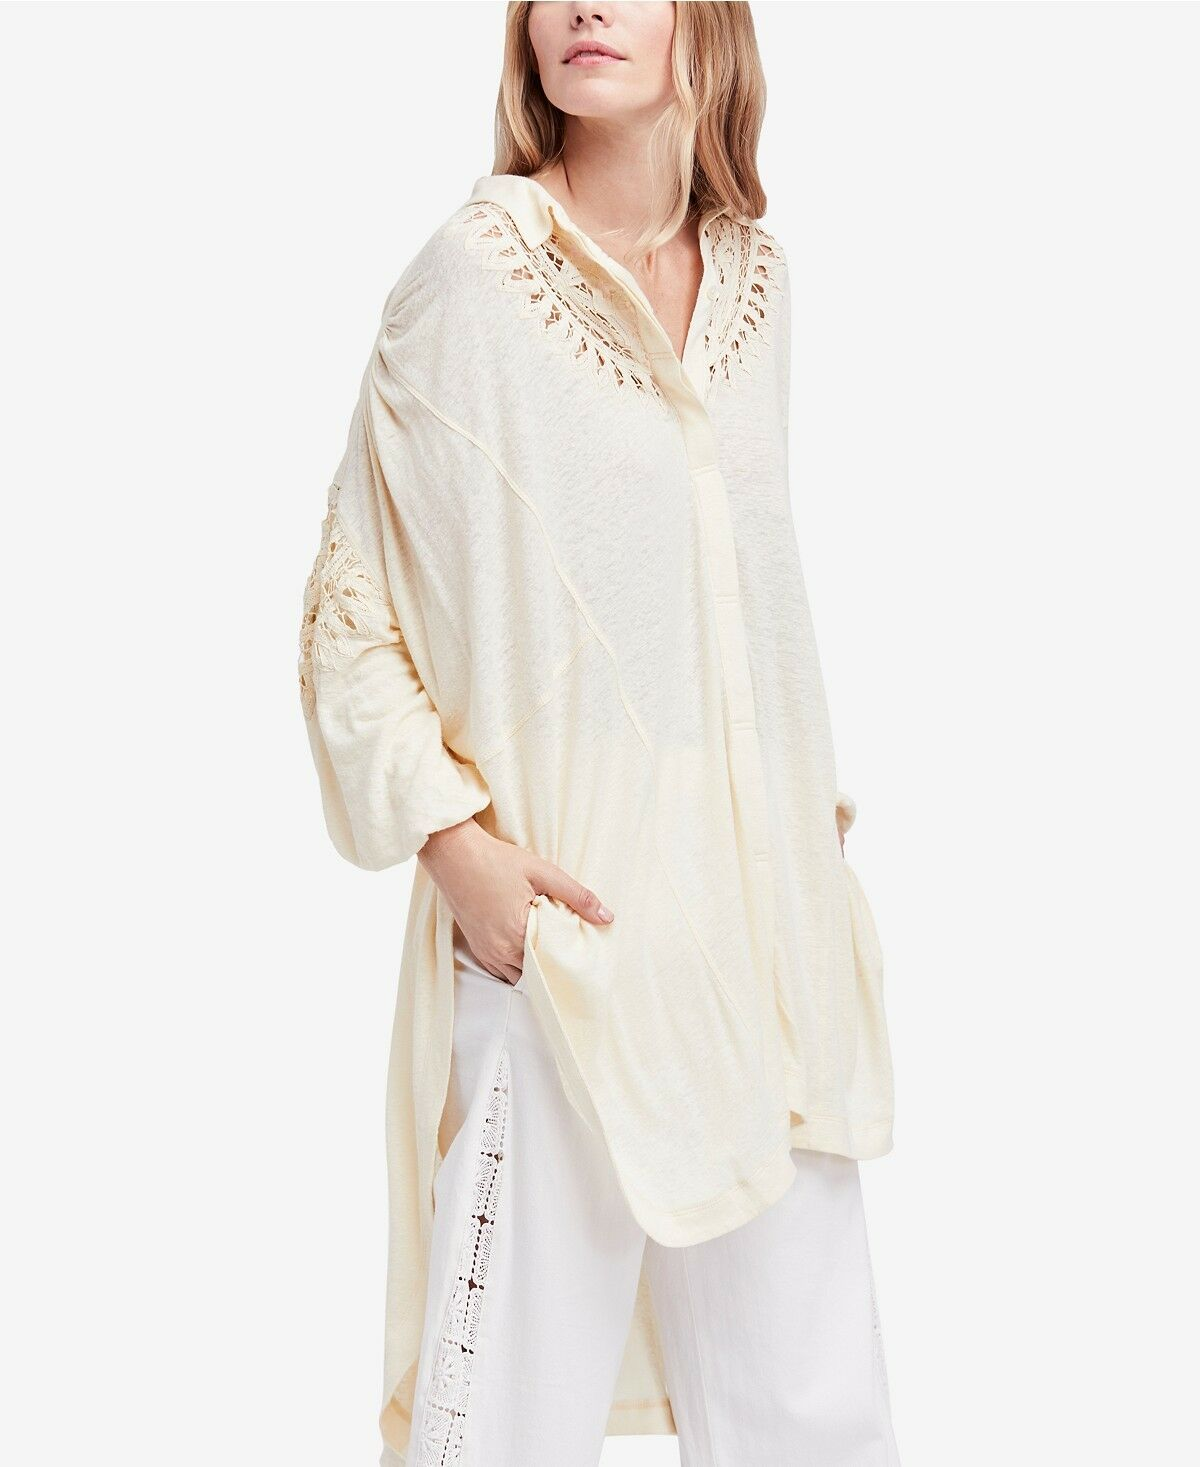 NWT Free people Memory Lane Crochet-Inset Shirt Retail